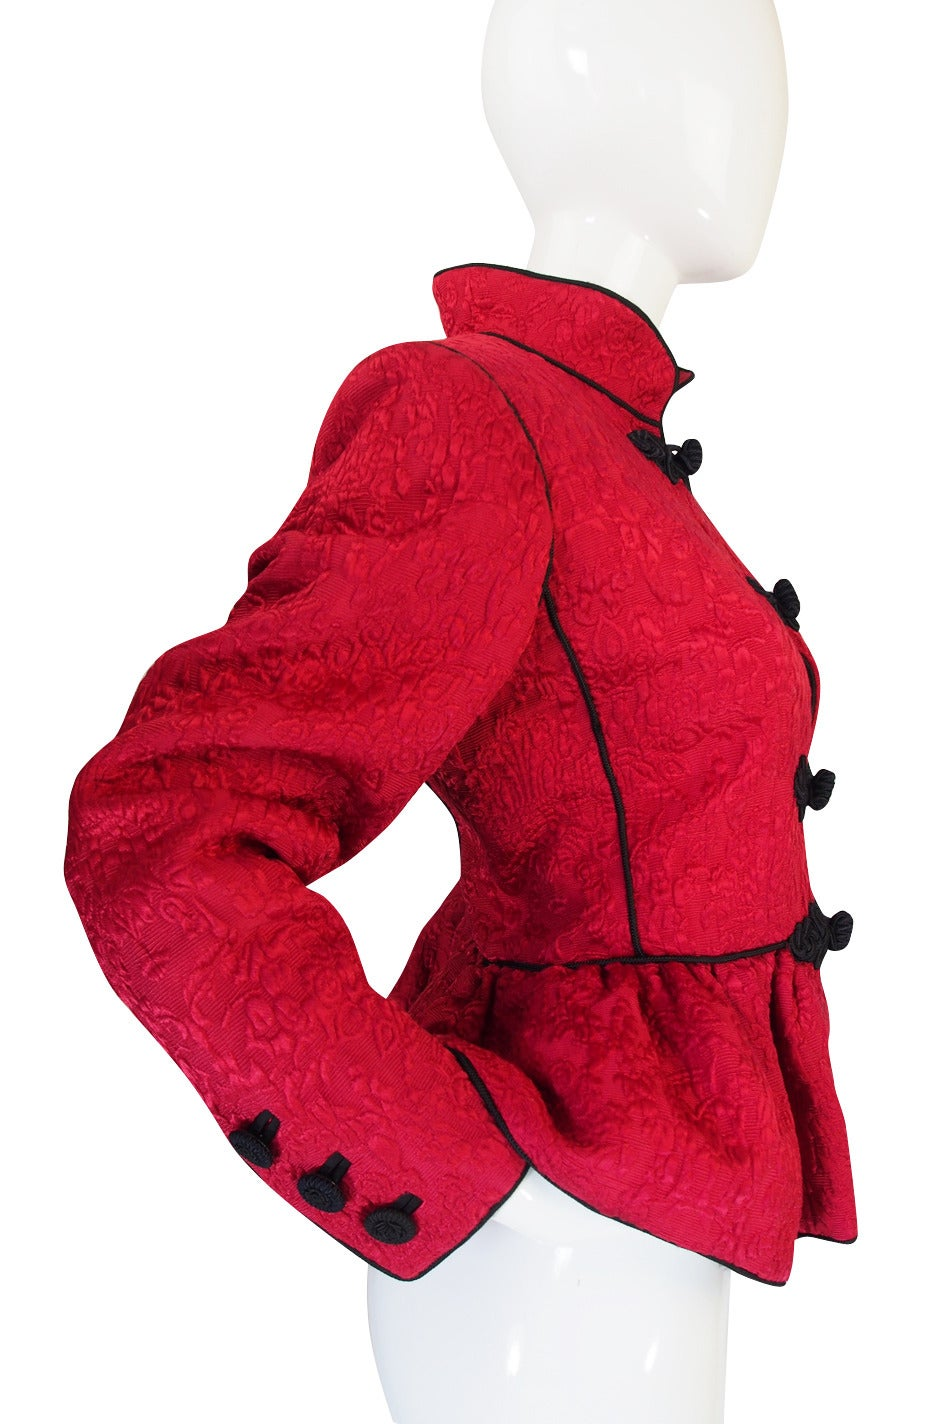 c1977-78 Yves Saint Laurent Chinoiserie Jacket 5